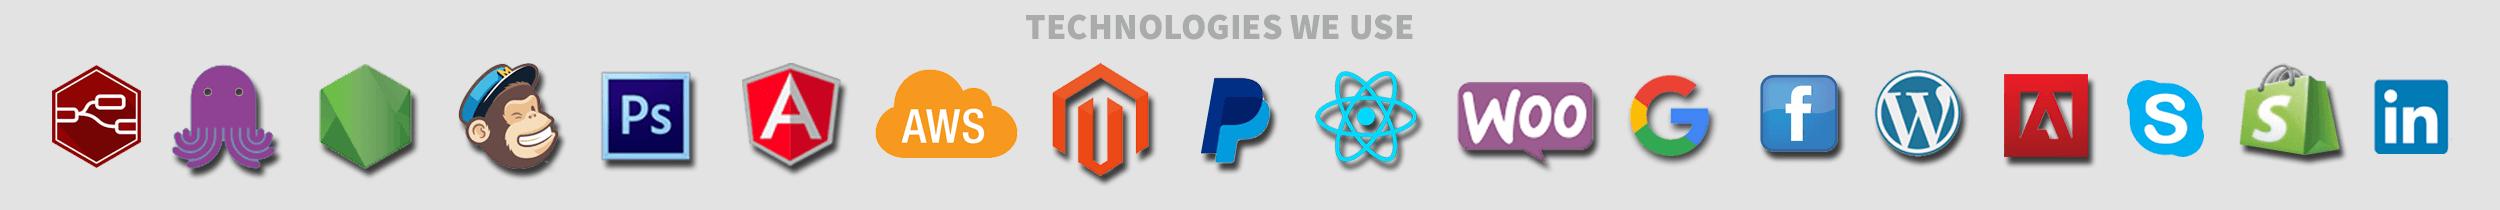 Technology We Use at ProDeveloper for Web Design St Pete